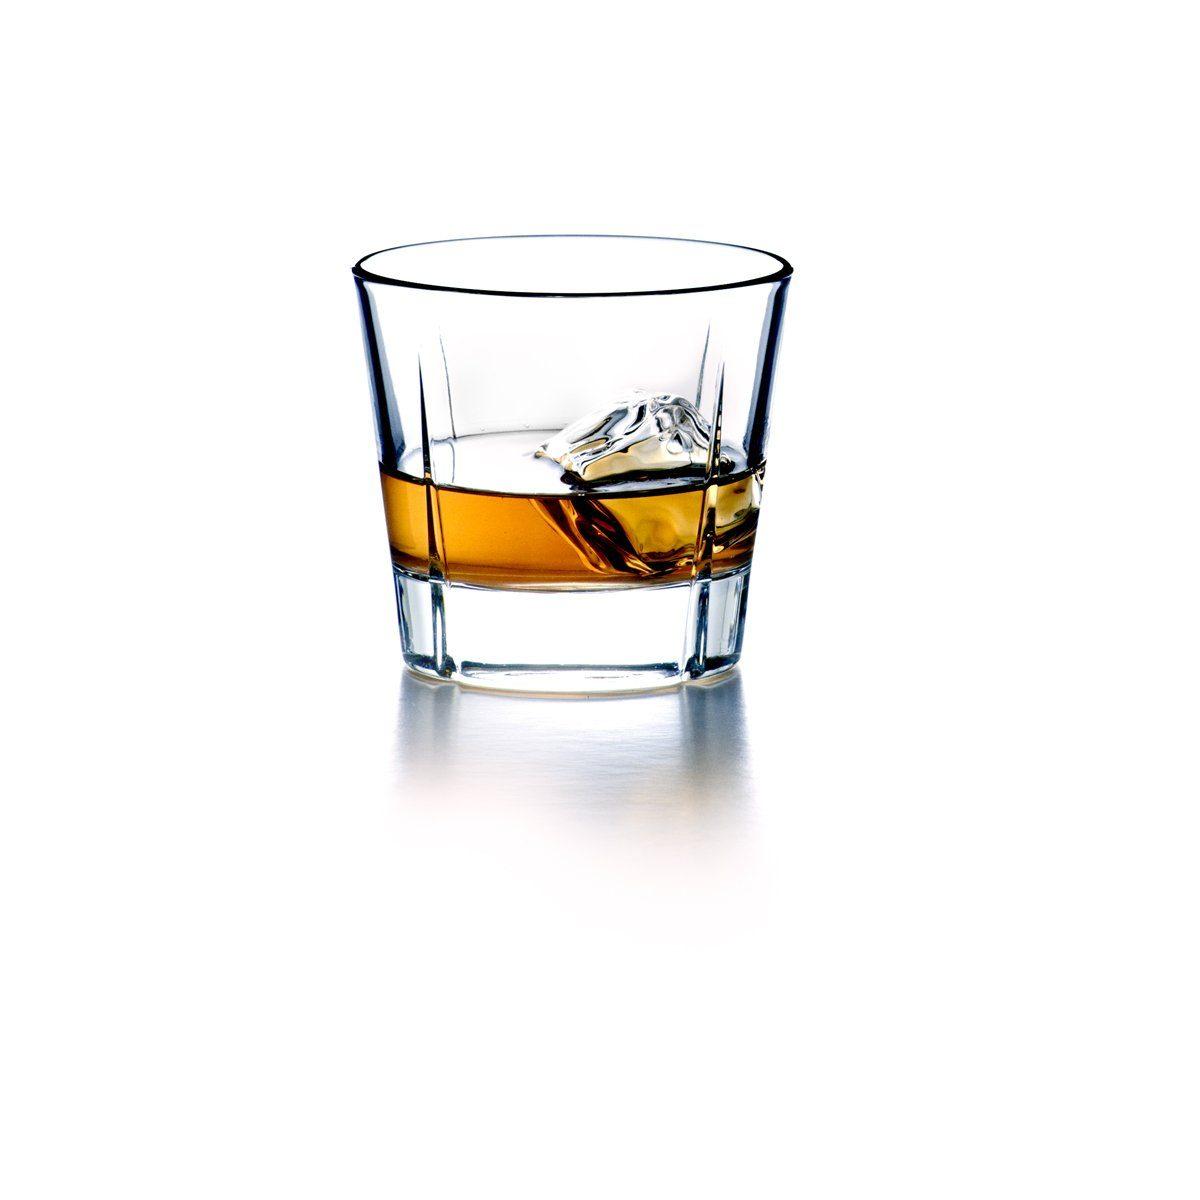 ROSENDAHL Rosendahl Grand Cru Whiskyglas 4er Set